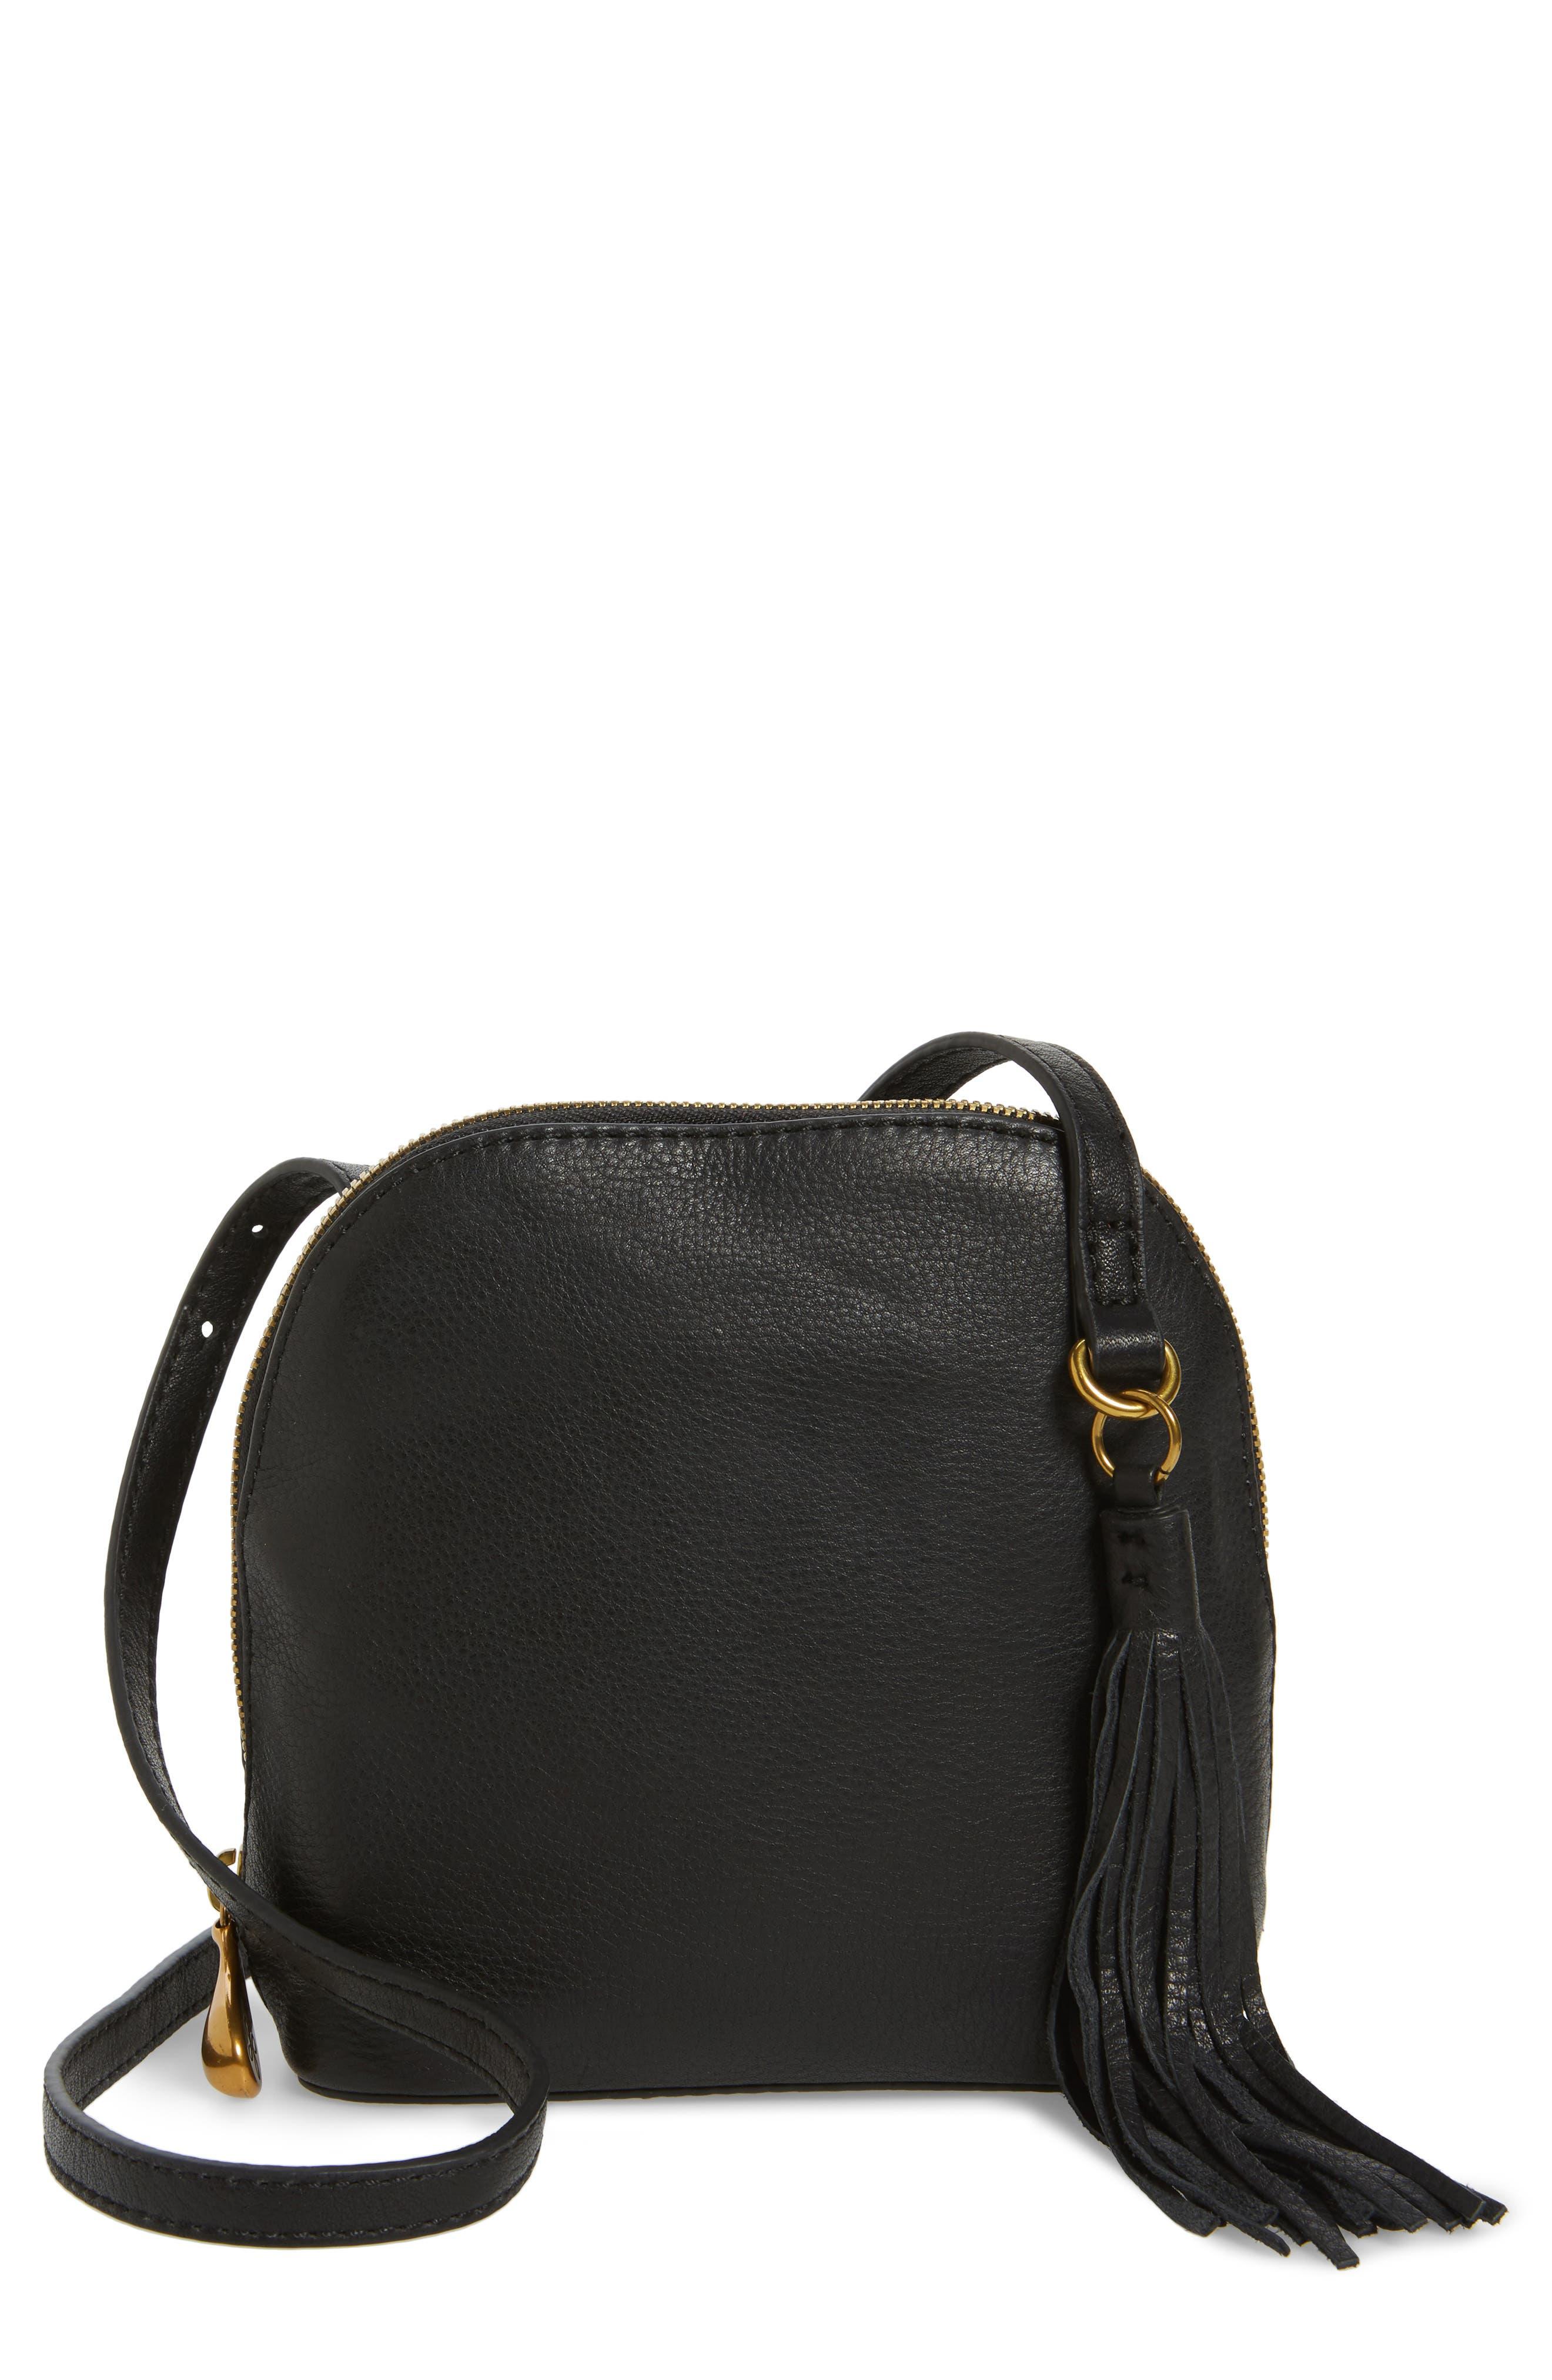 Nash Calfskin Leather Crossbody Bag,                         Main,                         color, Black